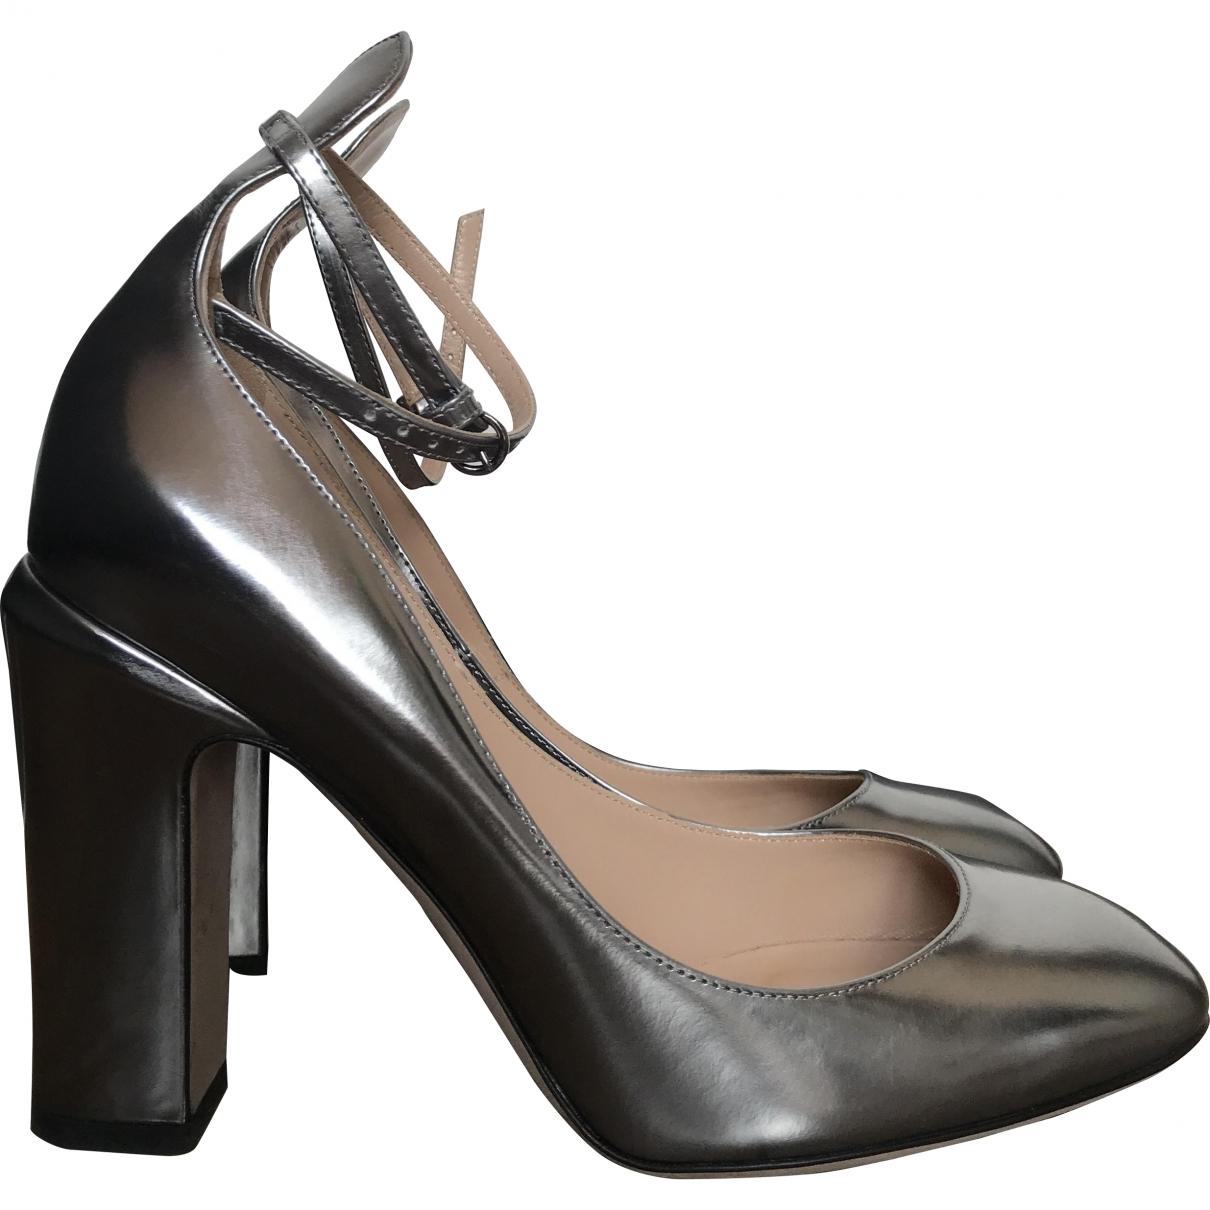 Valentino Garavani Tango Silver Patent leather Heels for Women 38.5 EU